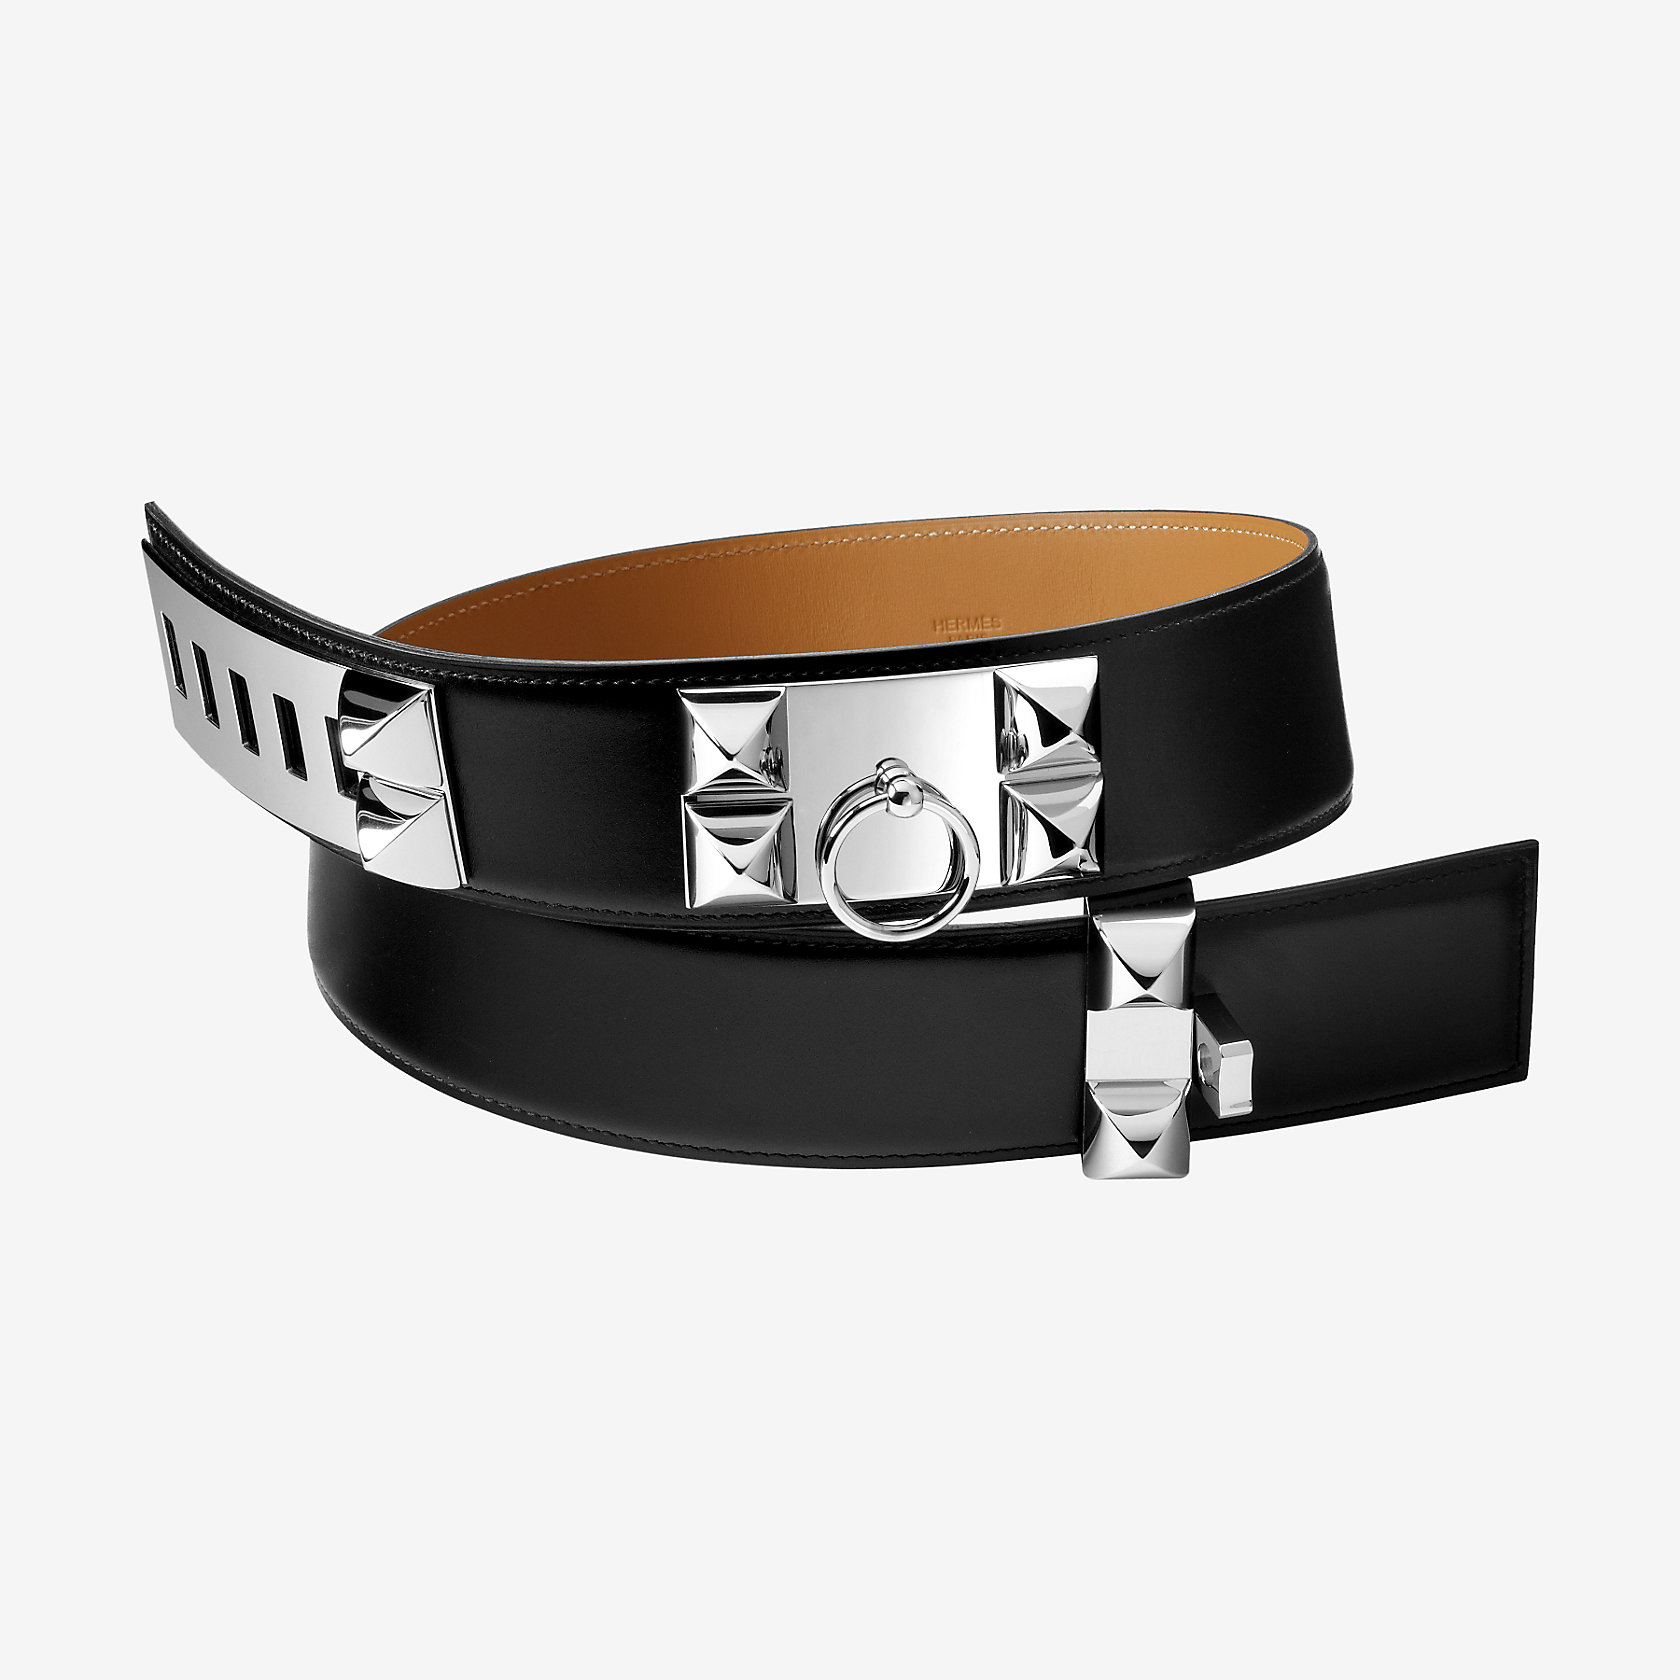 collier de chien belt herm s. Black Bedroom Furniture Sets. Home Design Ideas